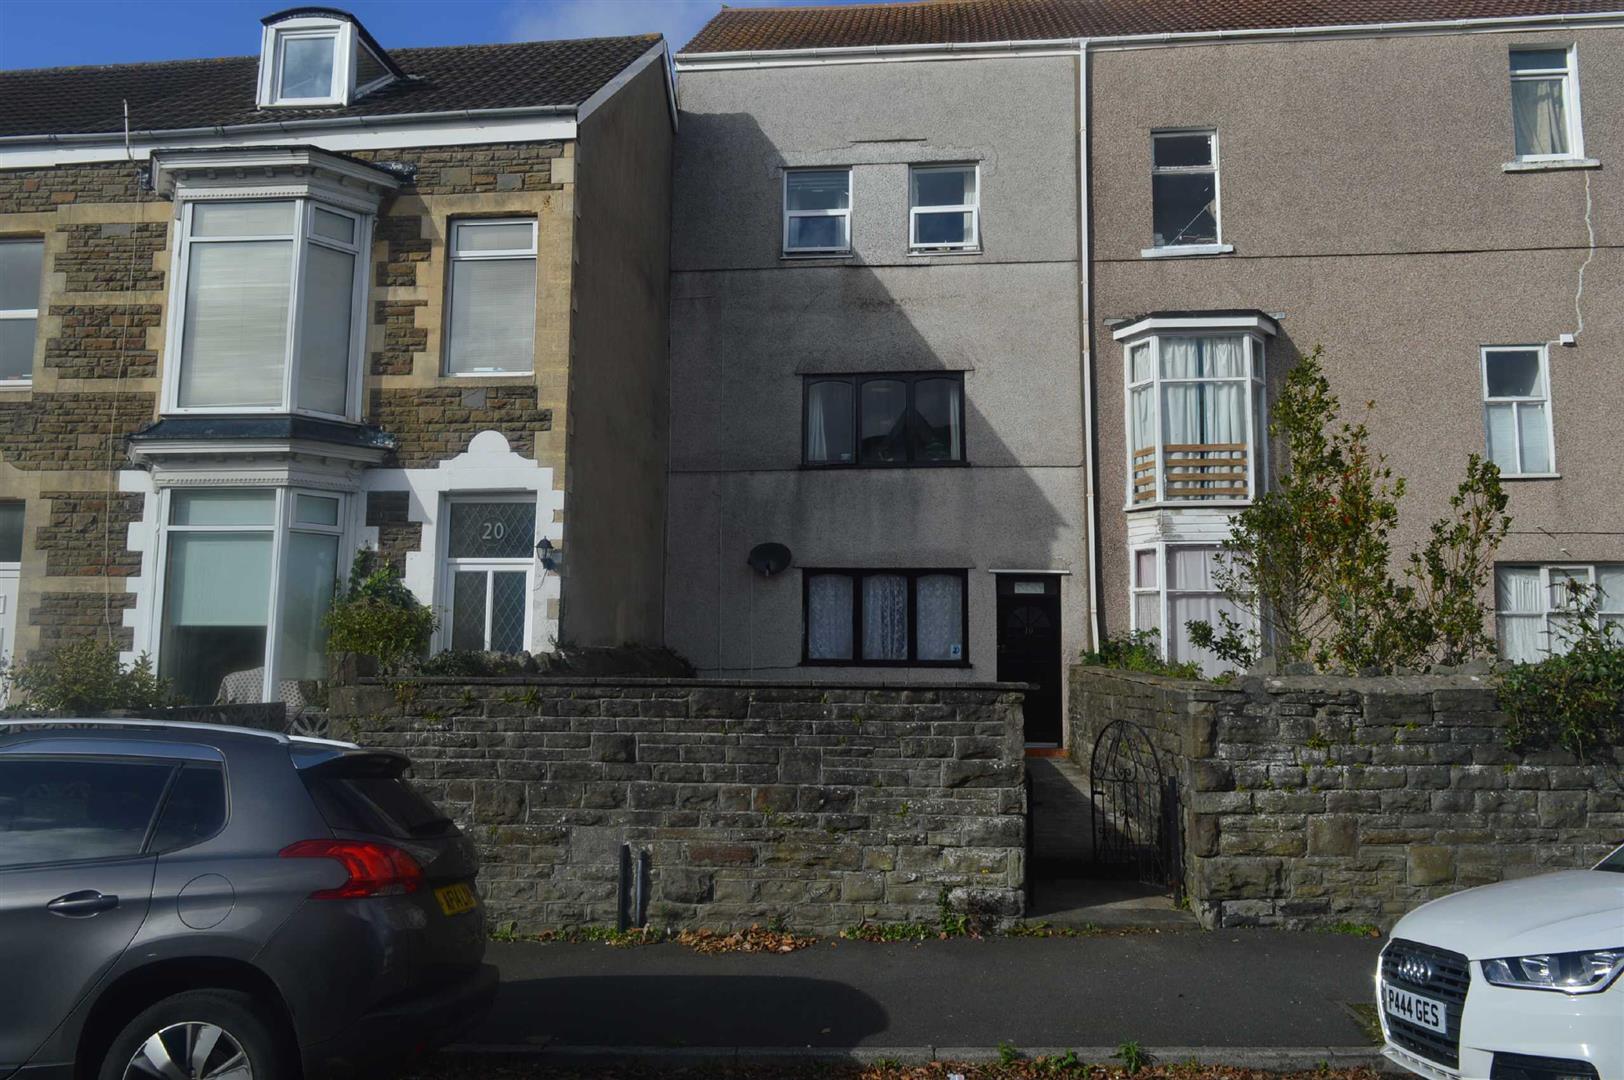 St Albans Road, Brynmill, Swansea, SA2 0BP